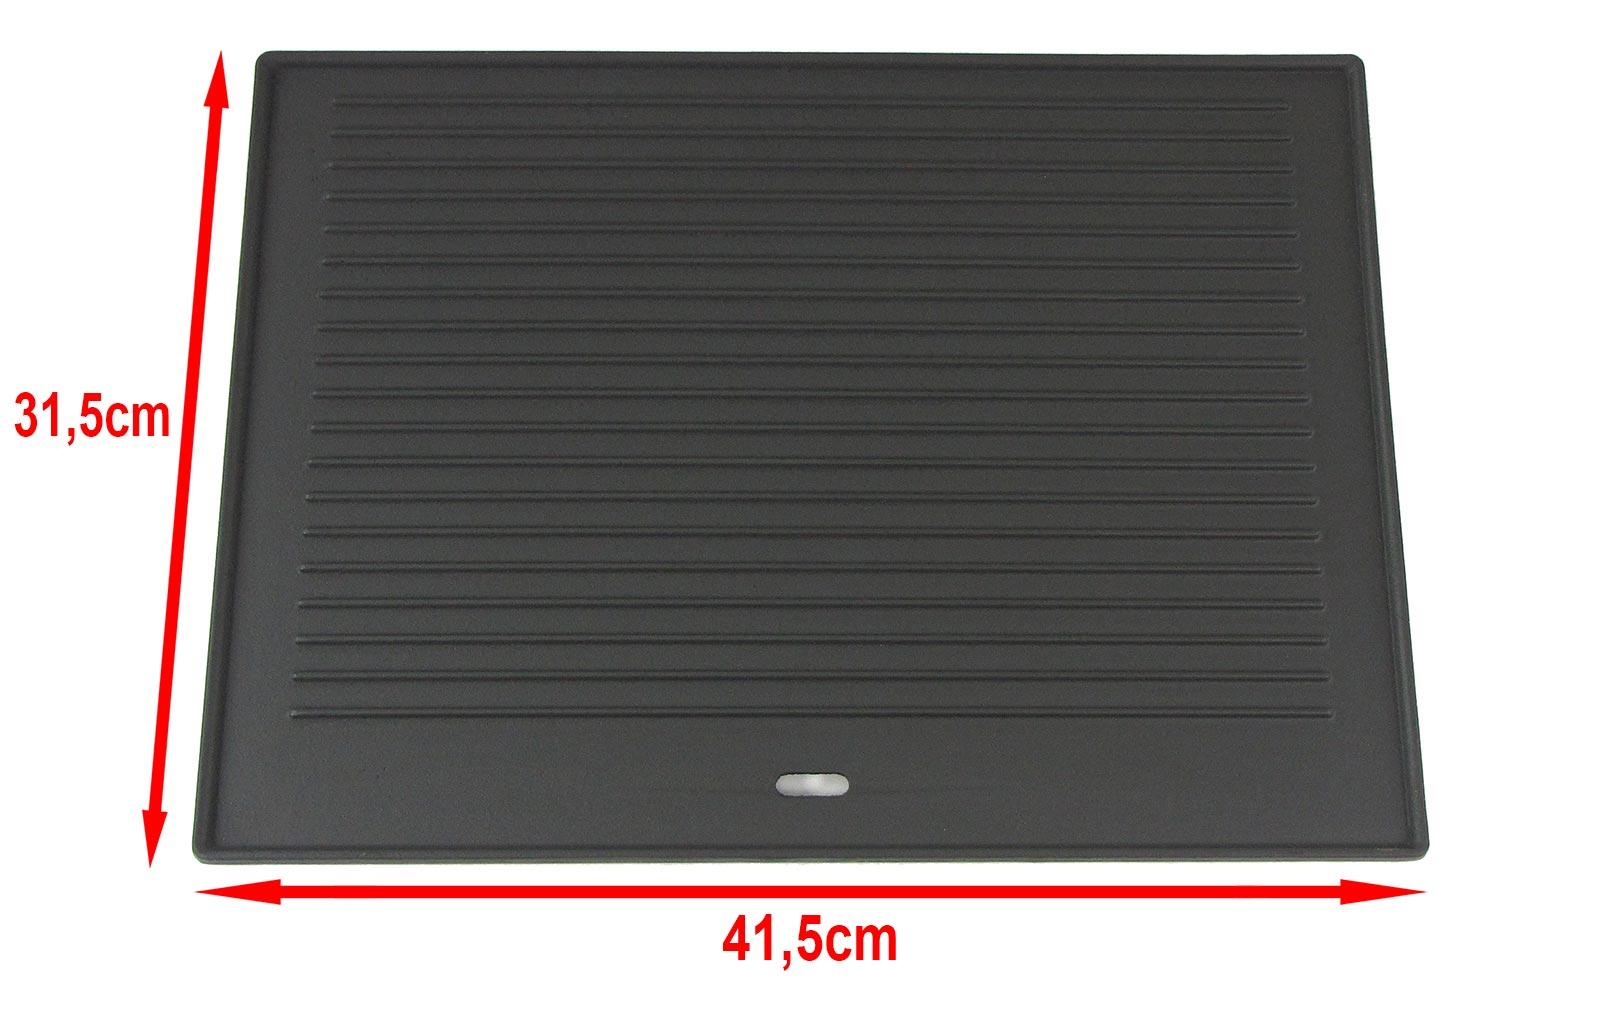 grillplatte wendeplatte pizzaplatte gusseisen f r gas grill 41 5cm x 31 5cm ebay. Black Bedroom Furniture Sets. Home Design Ideas